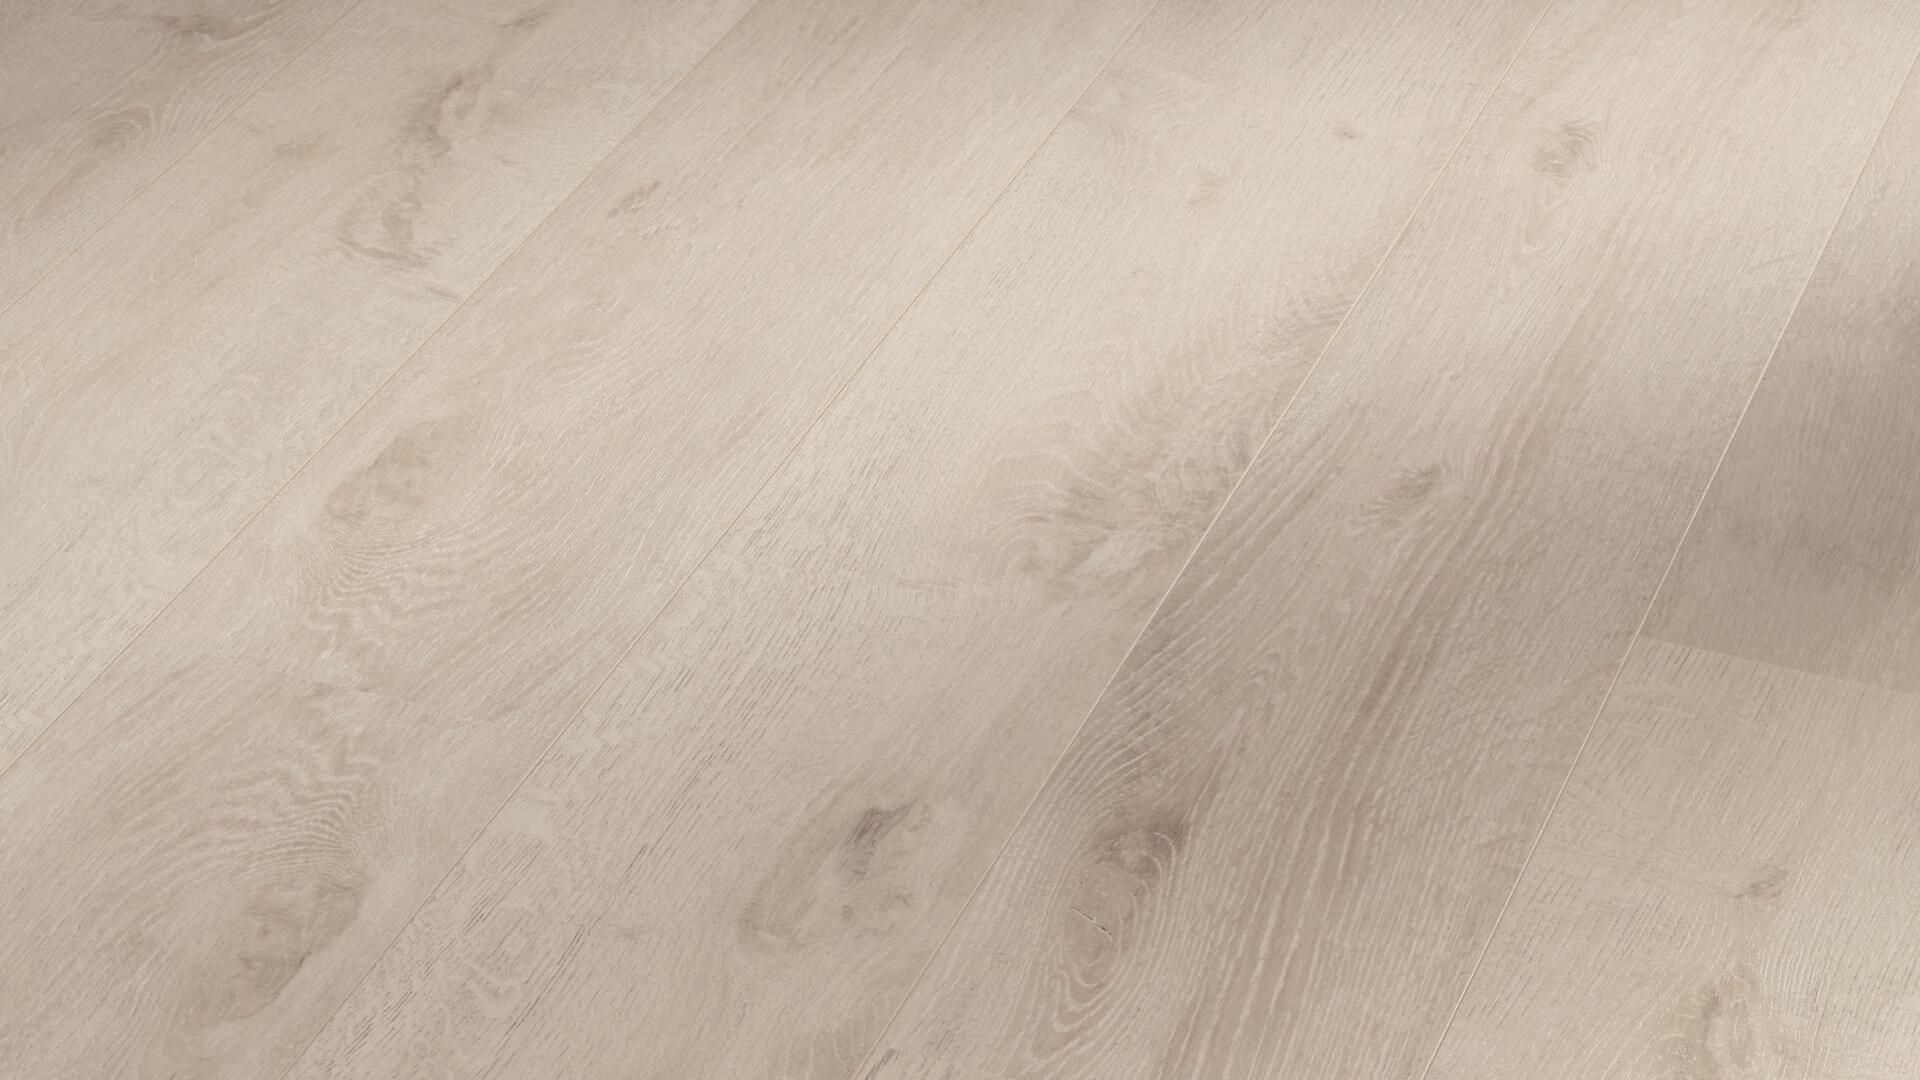 Suelo laminado Melango LD 300|20 Roble blanco ártico 6503